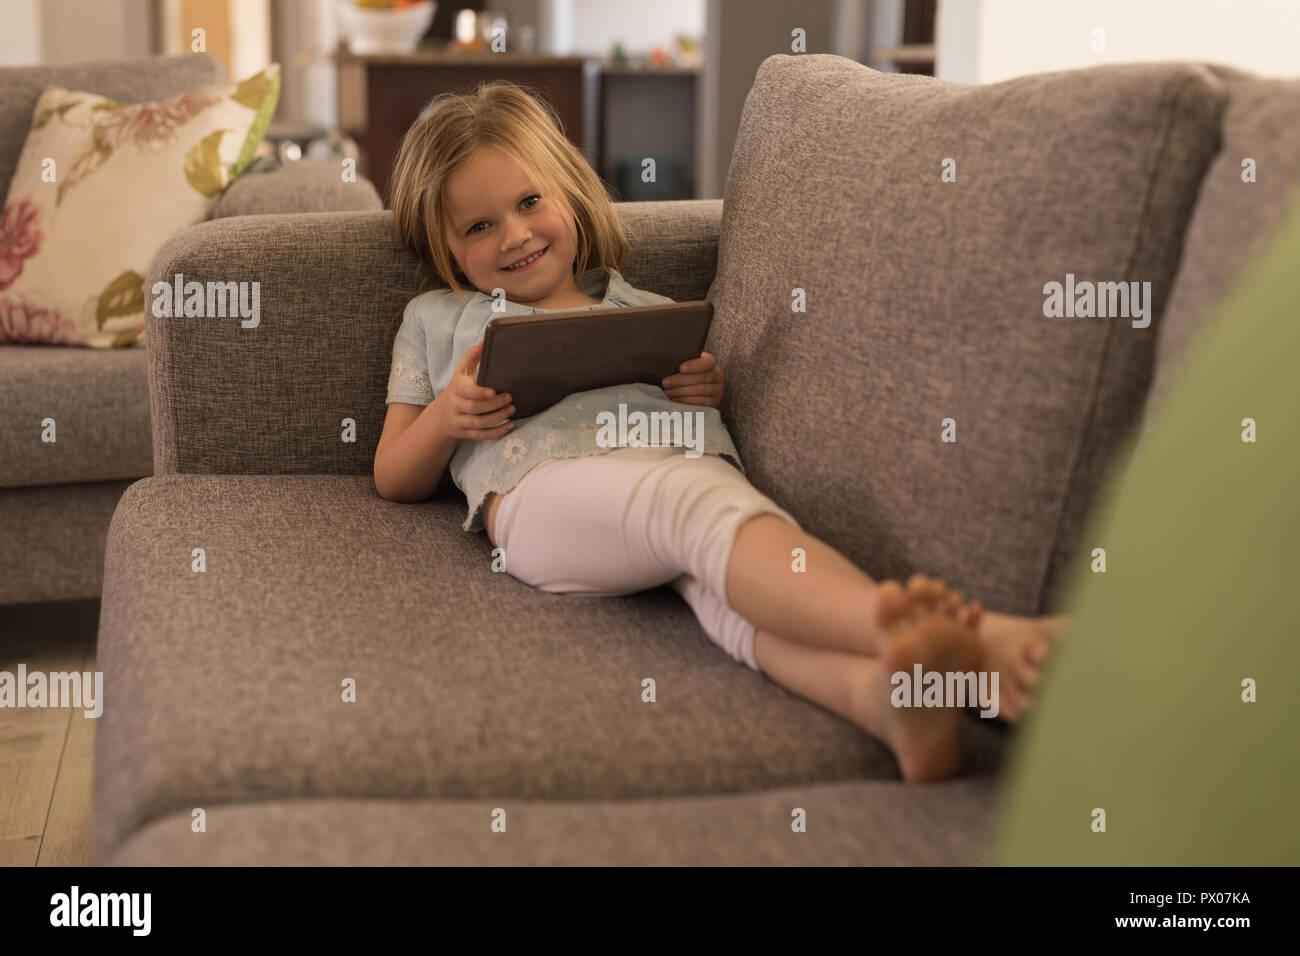 Girl using digital tablet in living room Banque D'Images